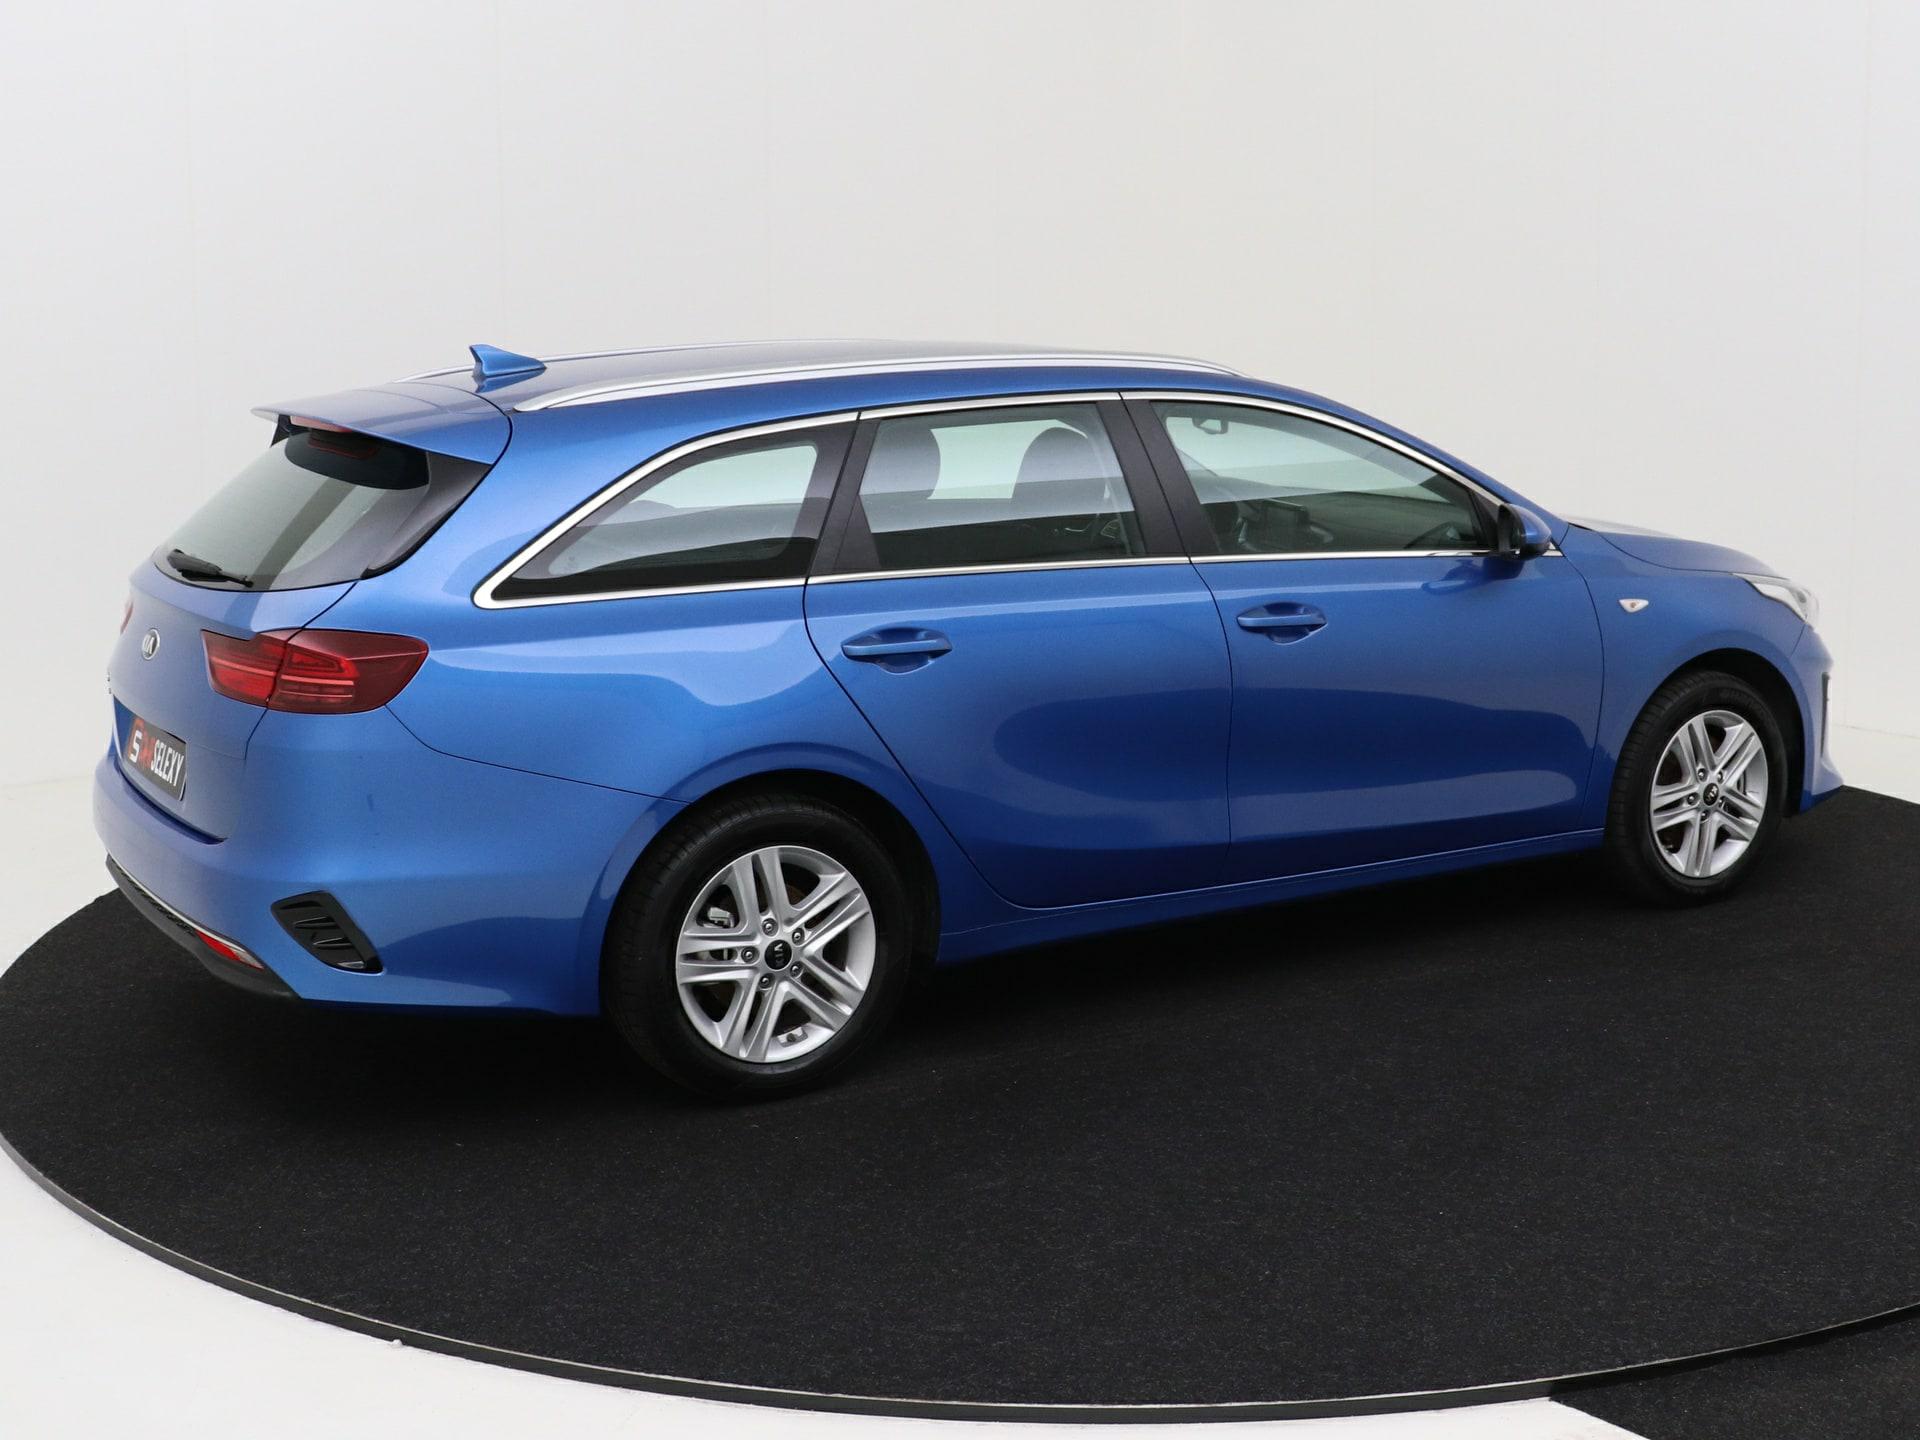 Kia Ceed Sportswagon 1.4 TGDi 140PK van CarSelexy.